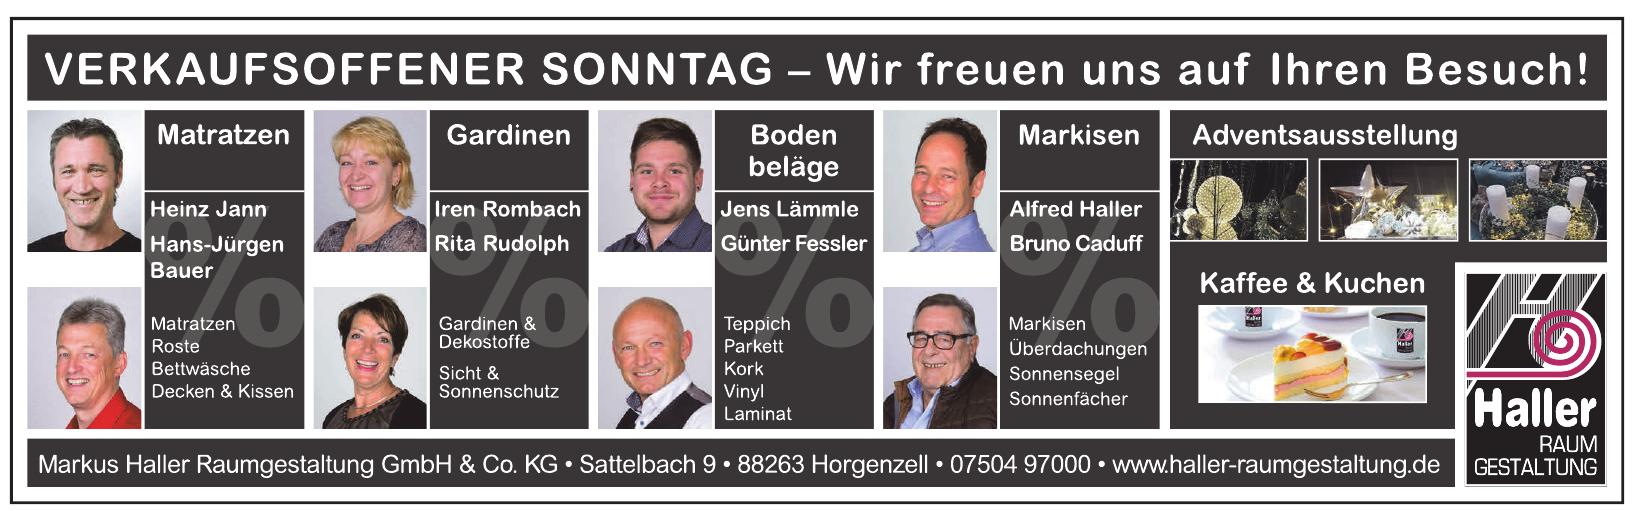 Markus Haller Raumgestaltung GmbH & Co. KG